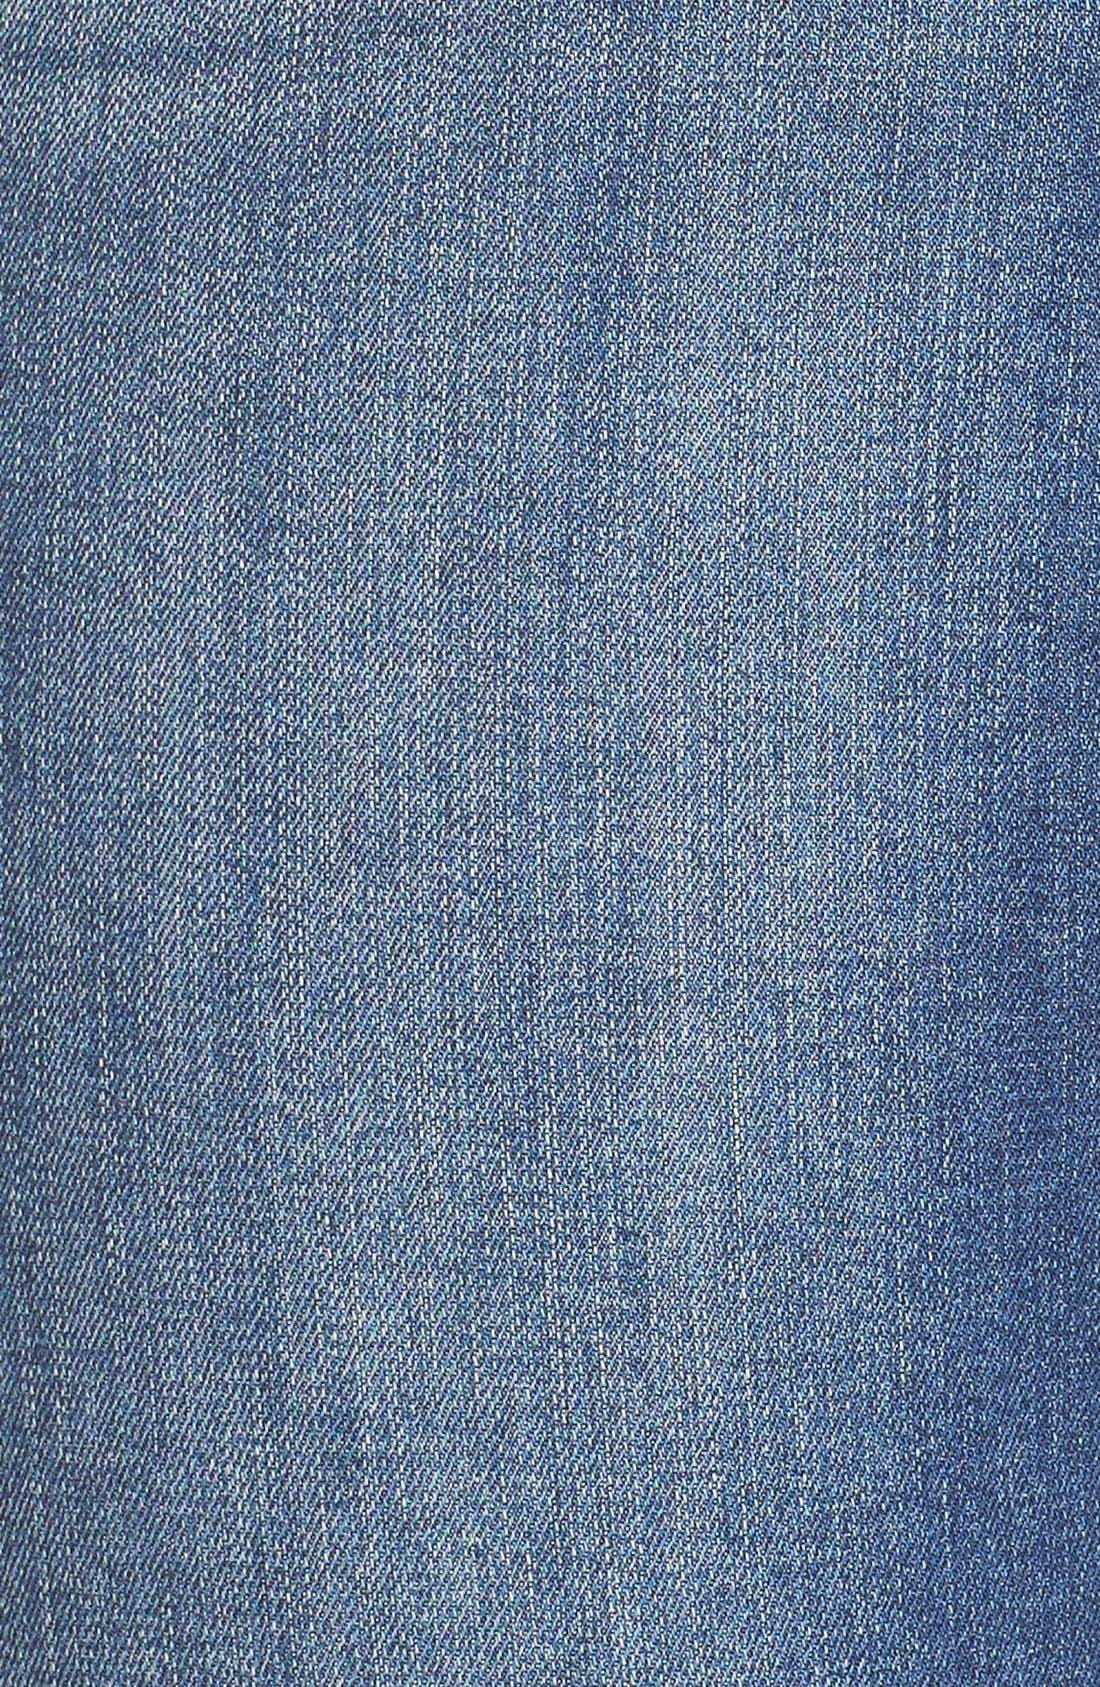 Stretch Crop Jeans,                             Alternate thumbnail 4, color,                             428